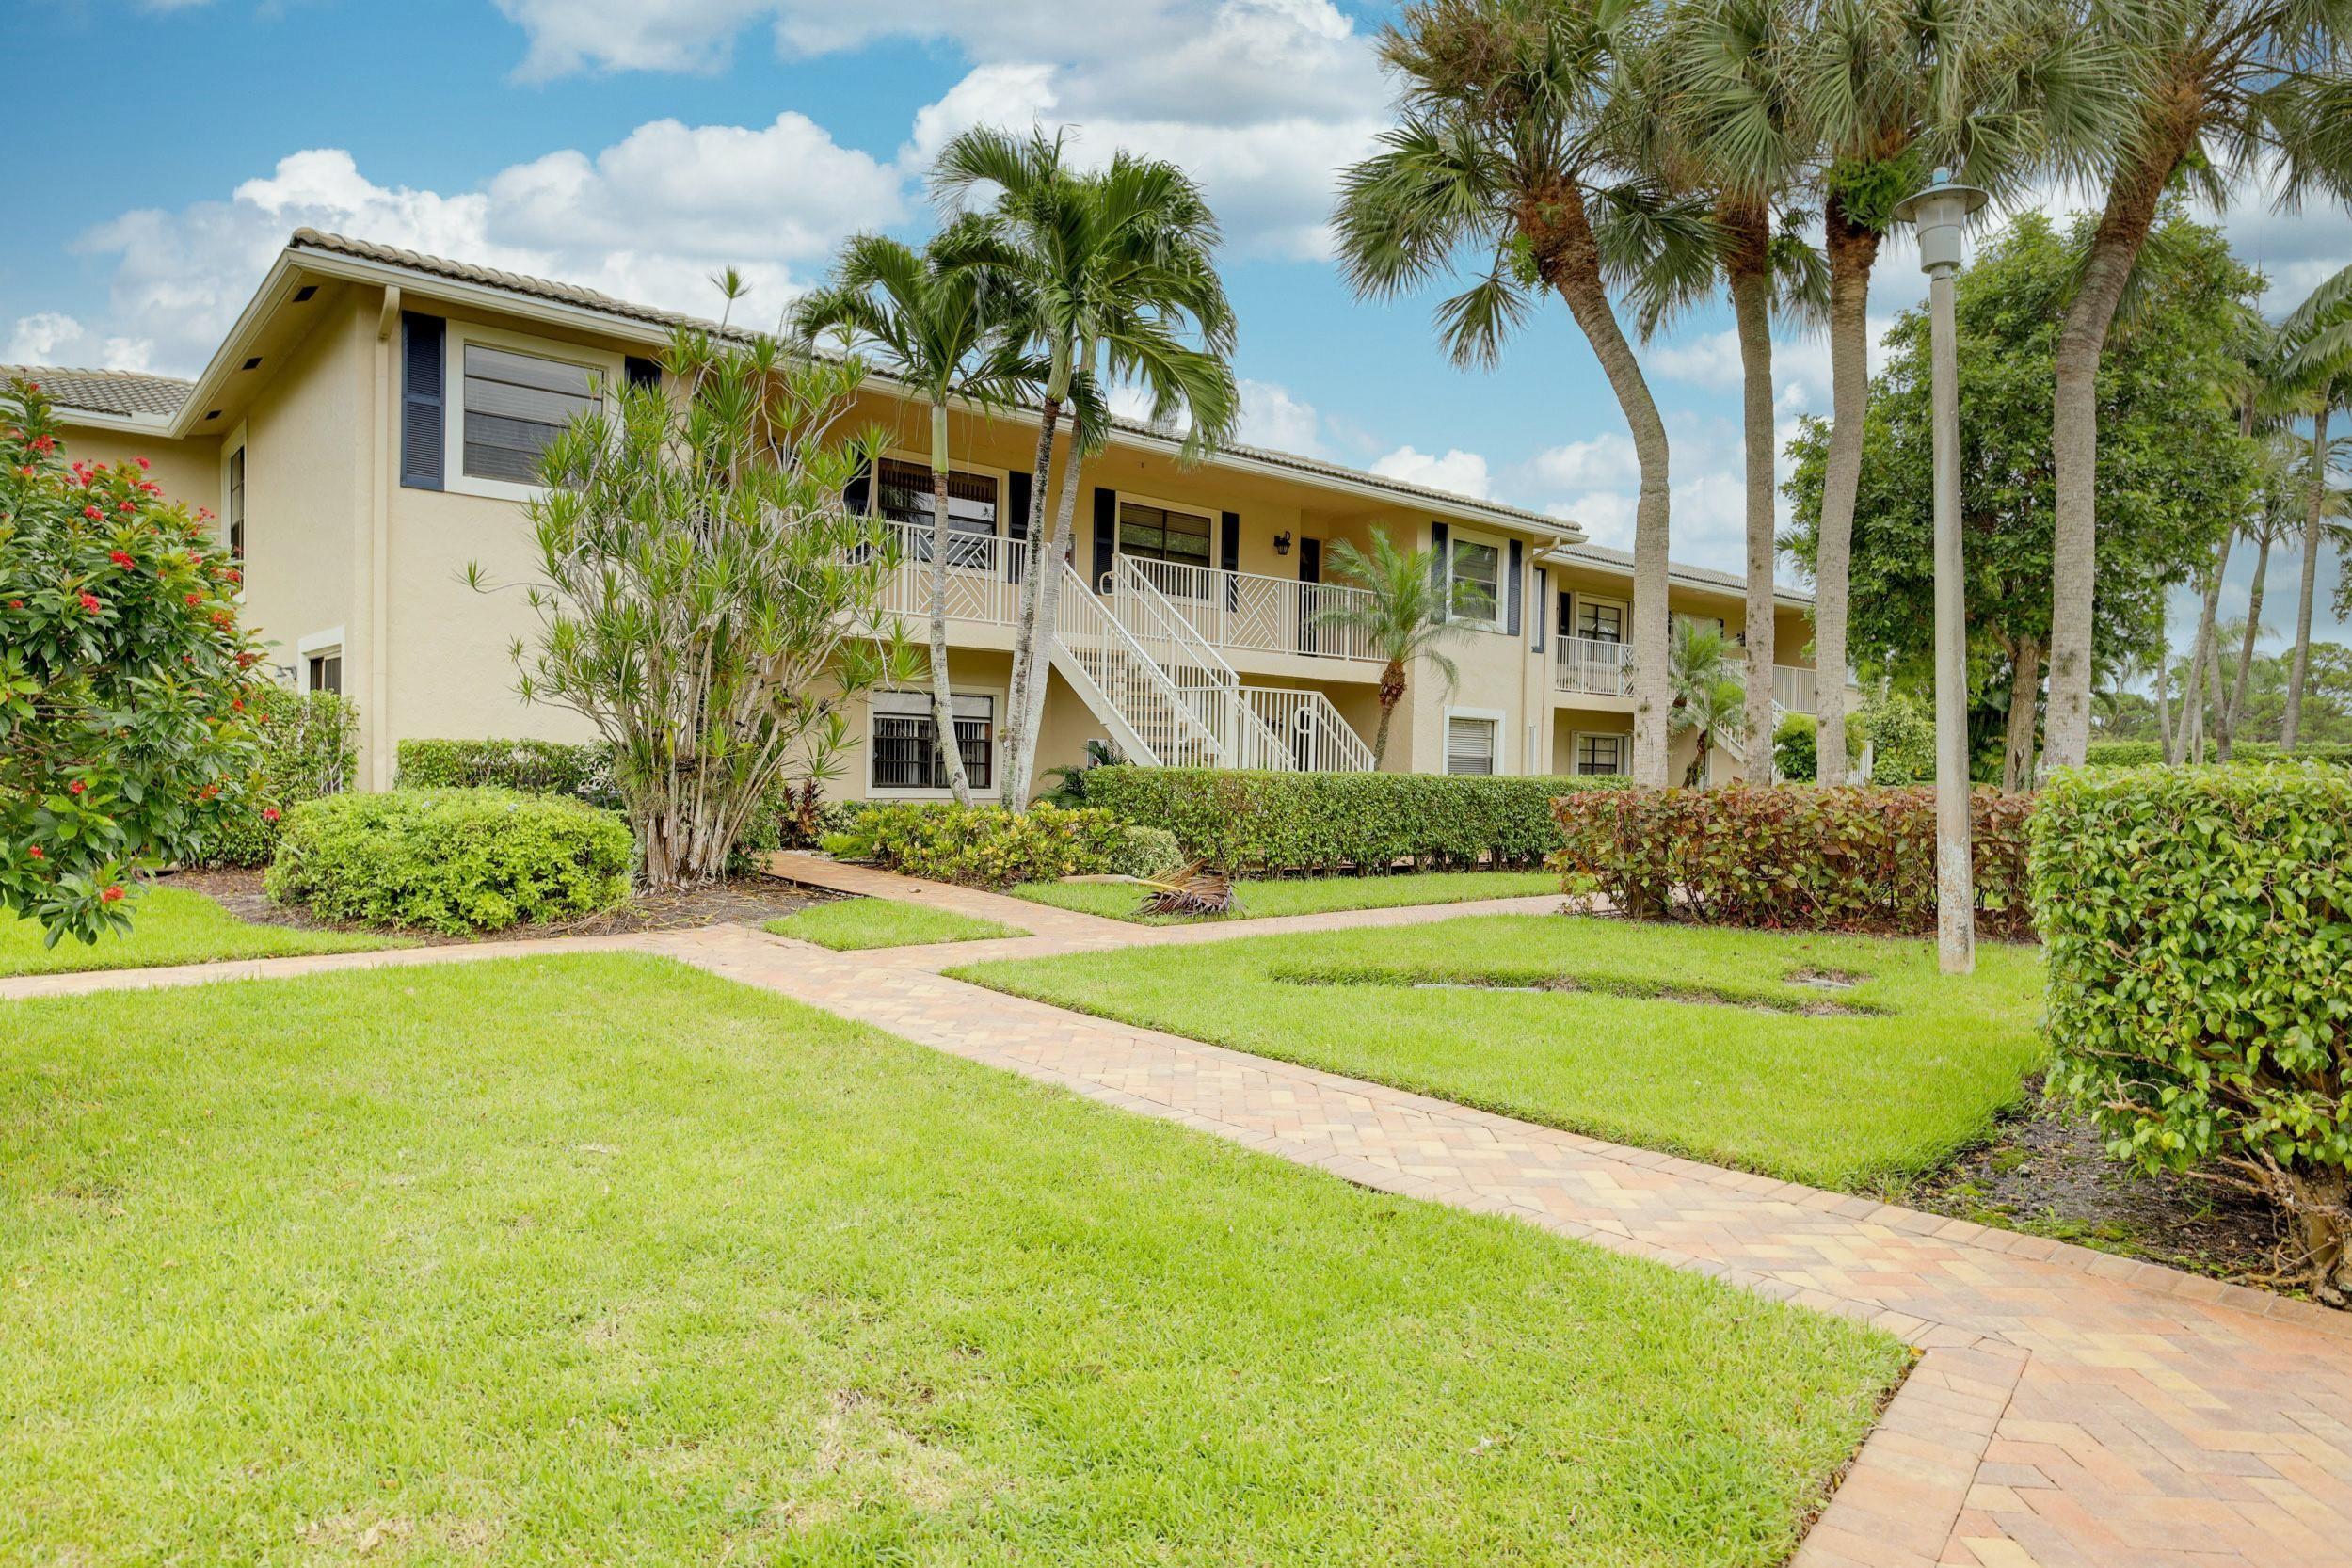 Photo of 7 Stratford Drive #F, Boynton Beach, FL 33436